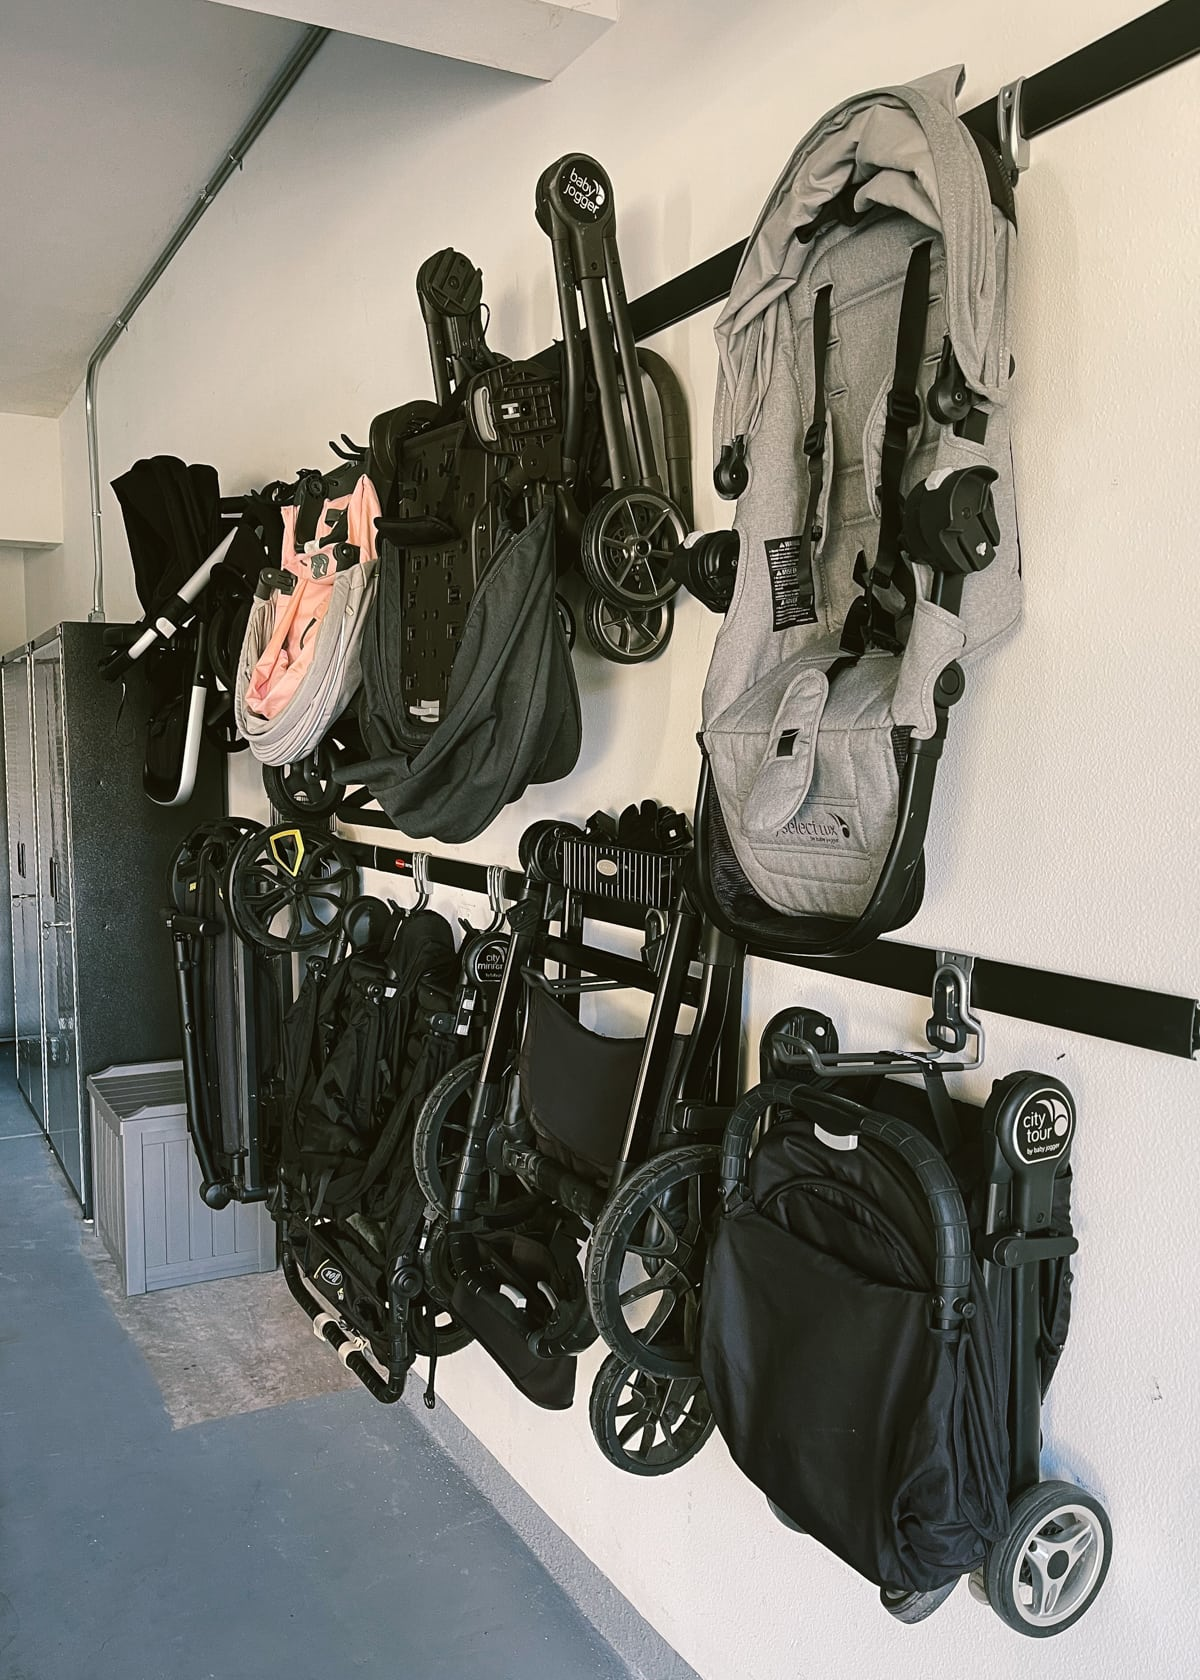 rail and hook kit garage organization tips